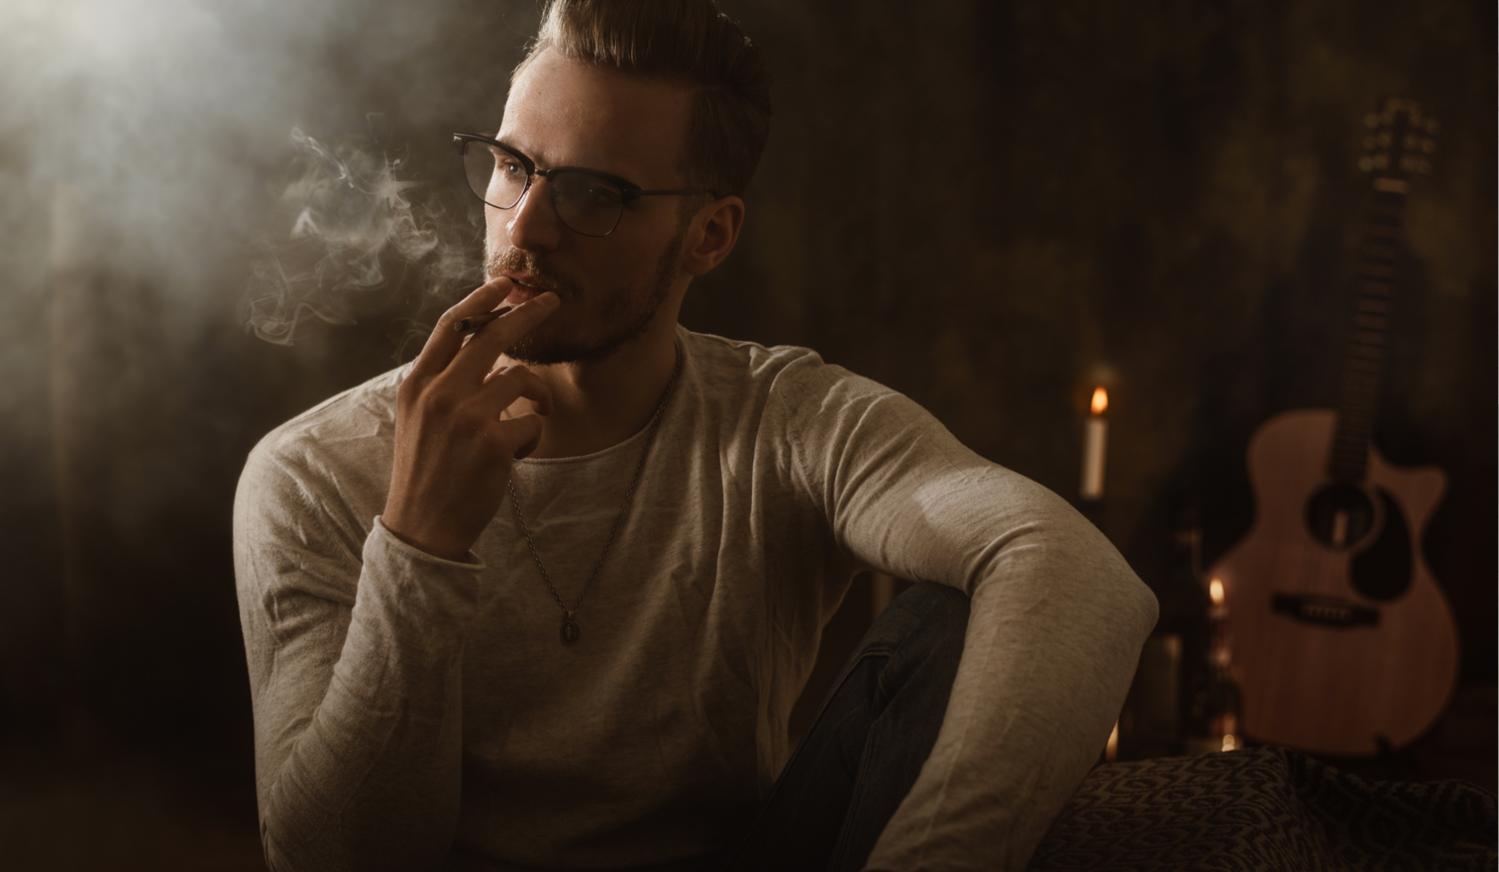 Last Smoke by Iiro Rautiainen